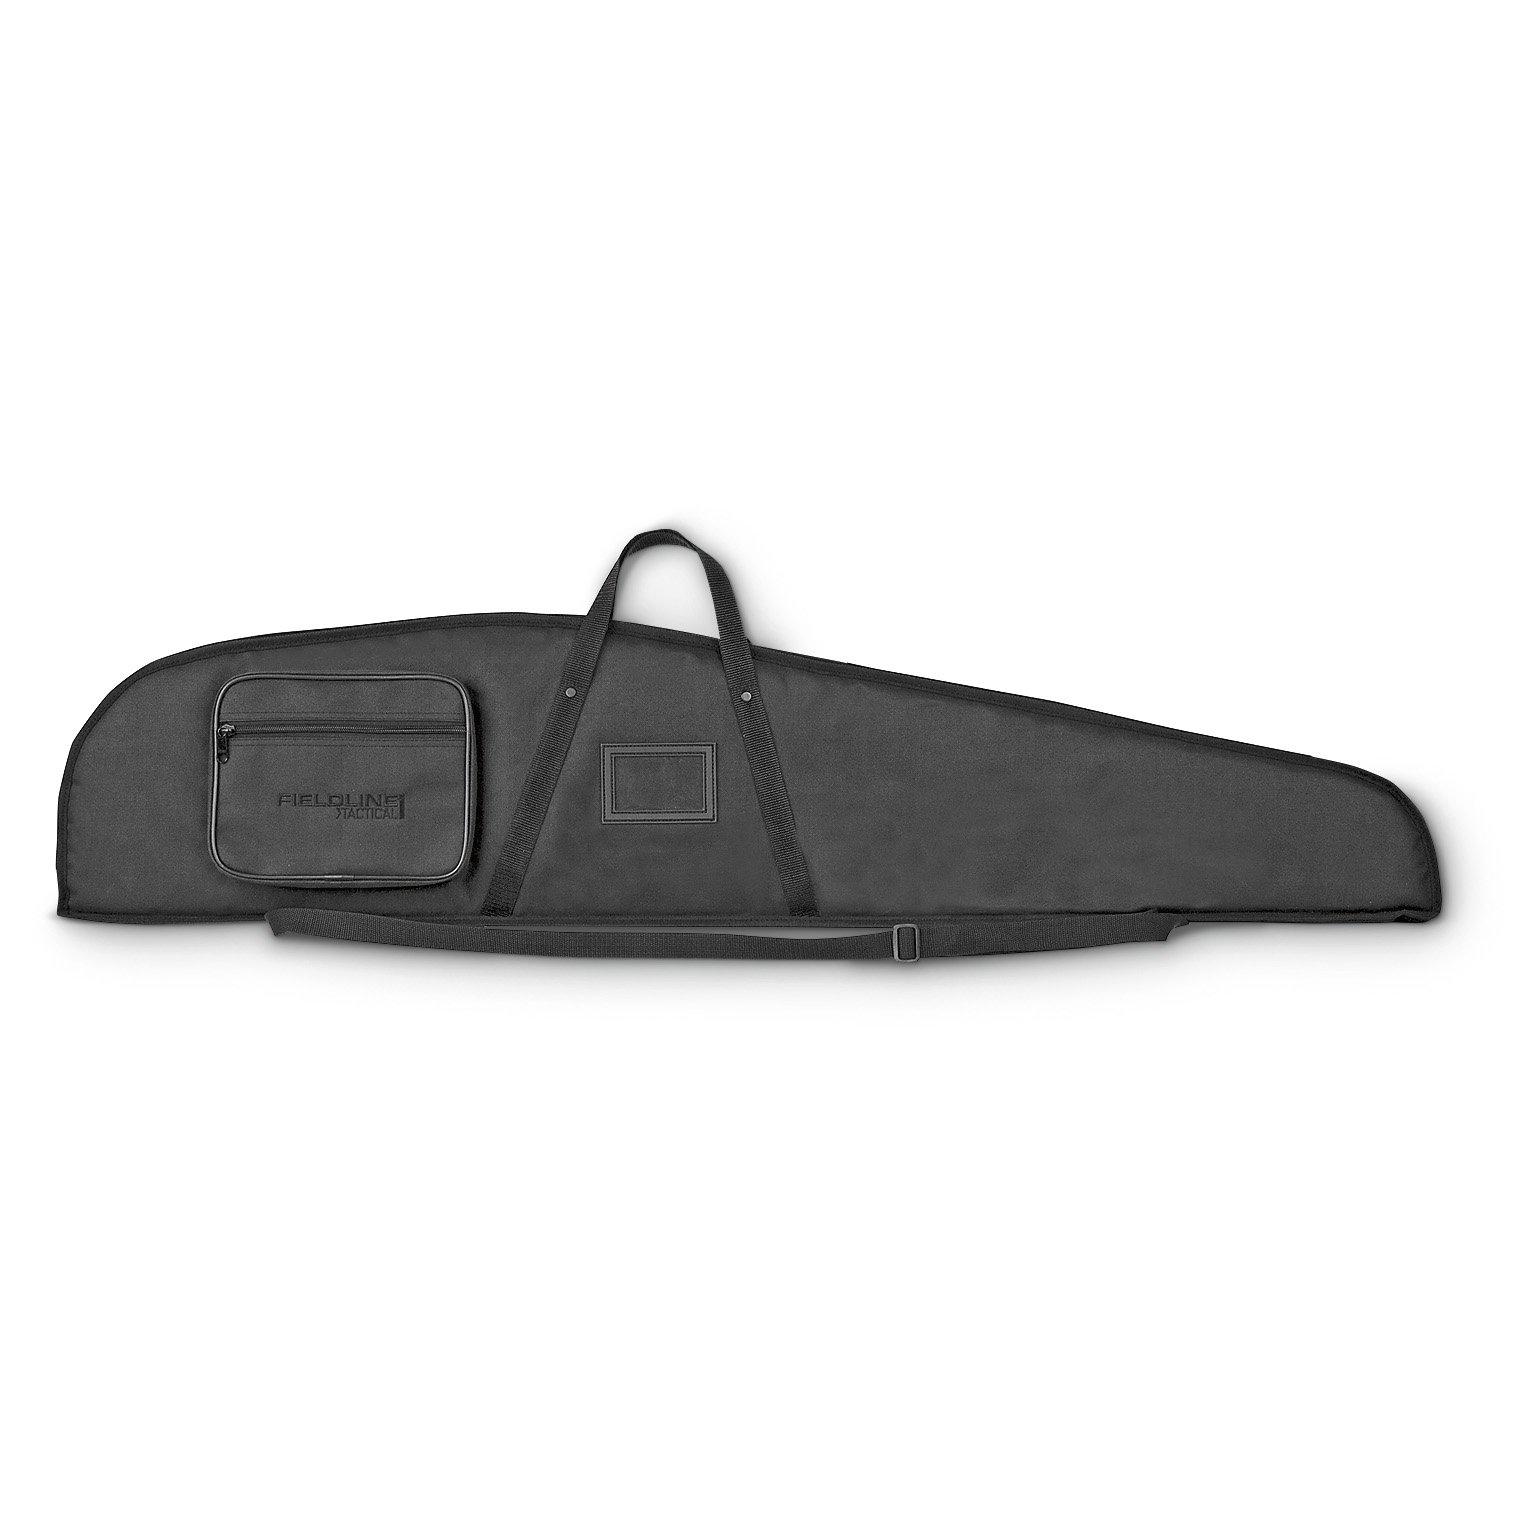 Fieldline Tactical 48 inch Scoped Rifle Case